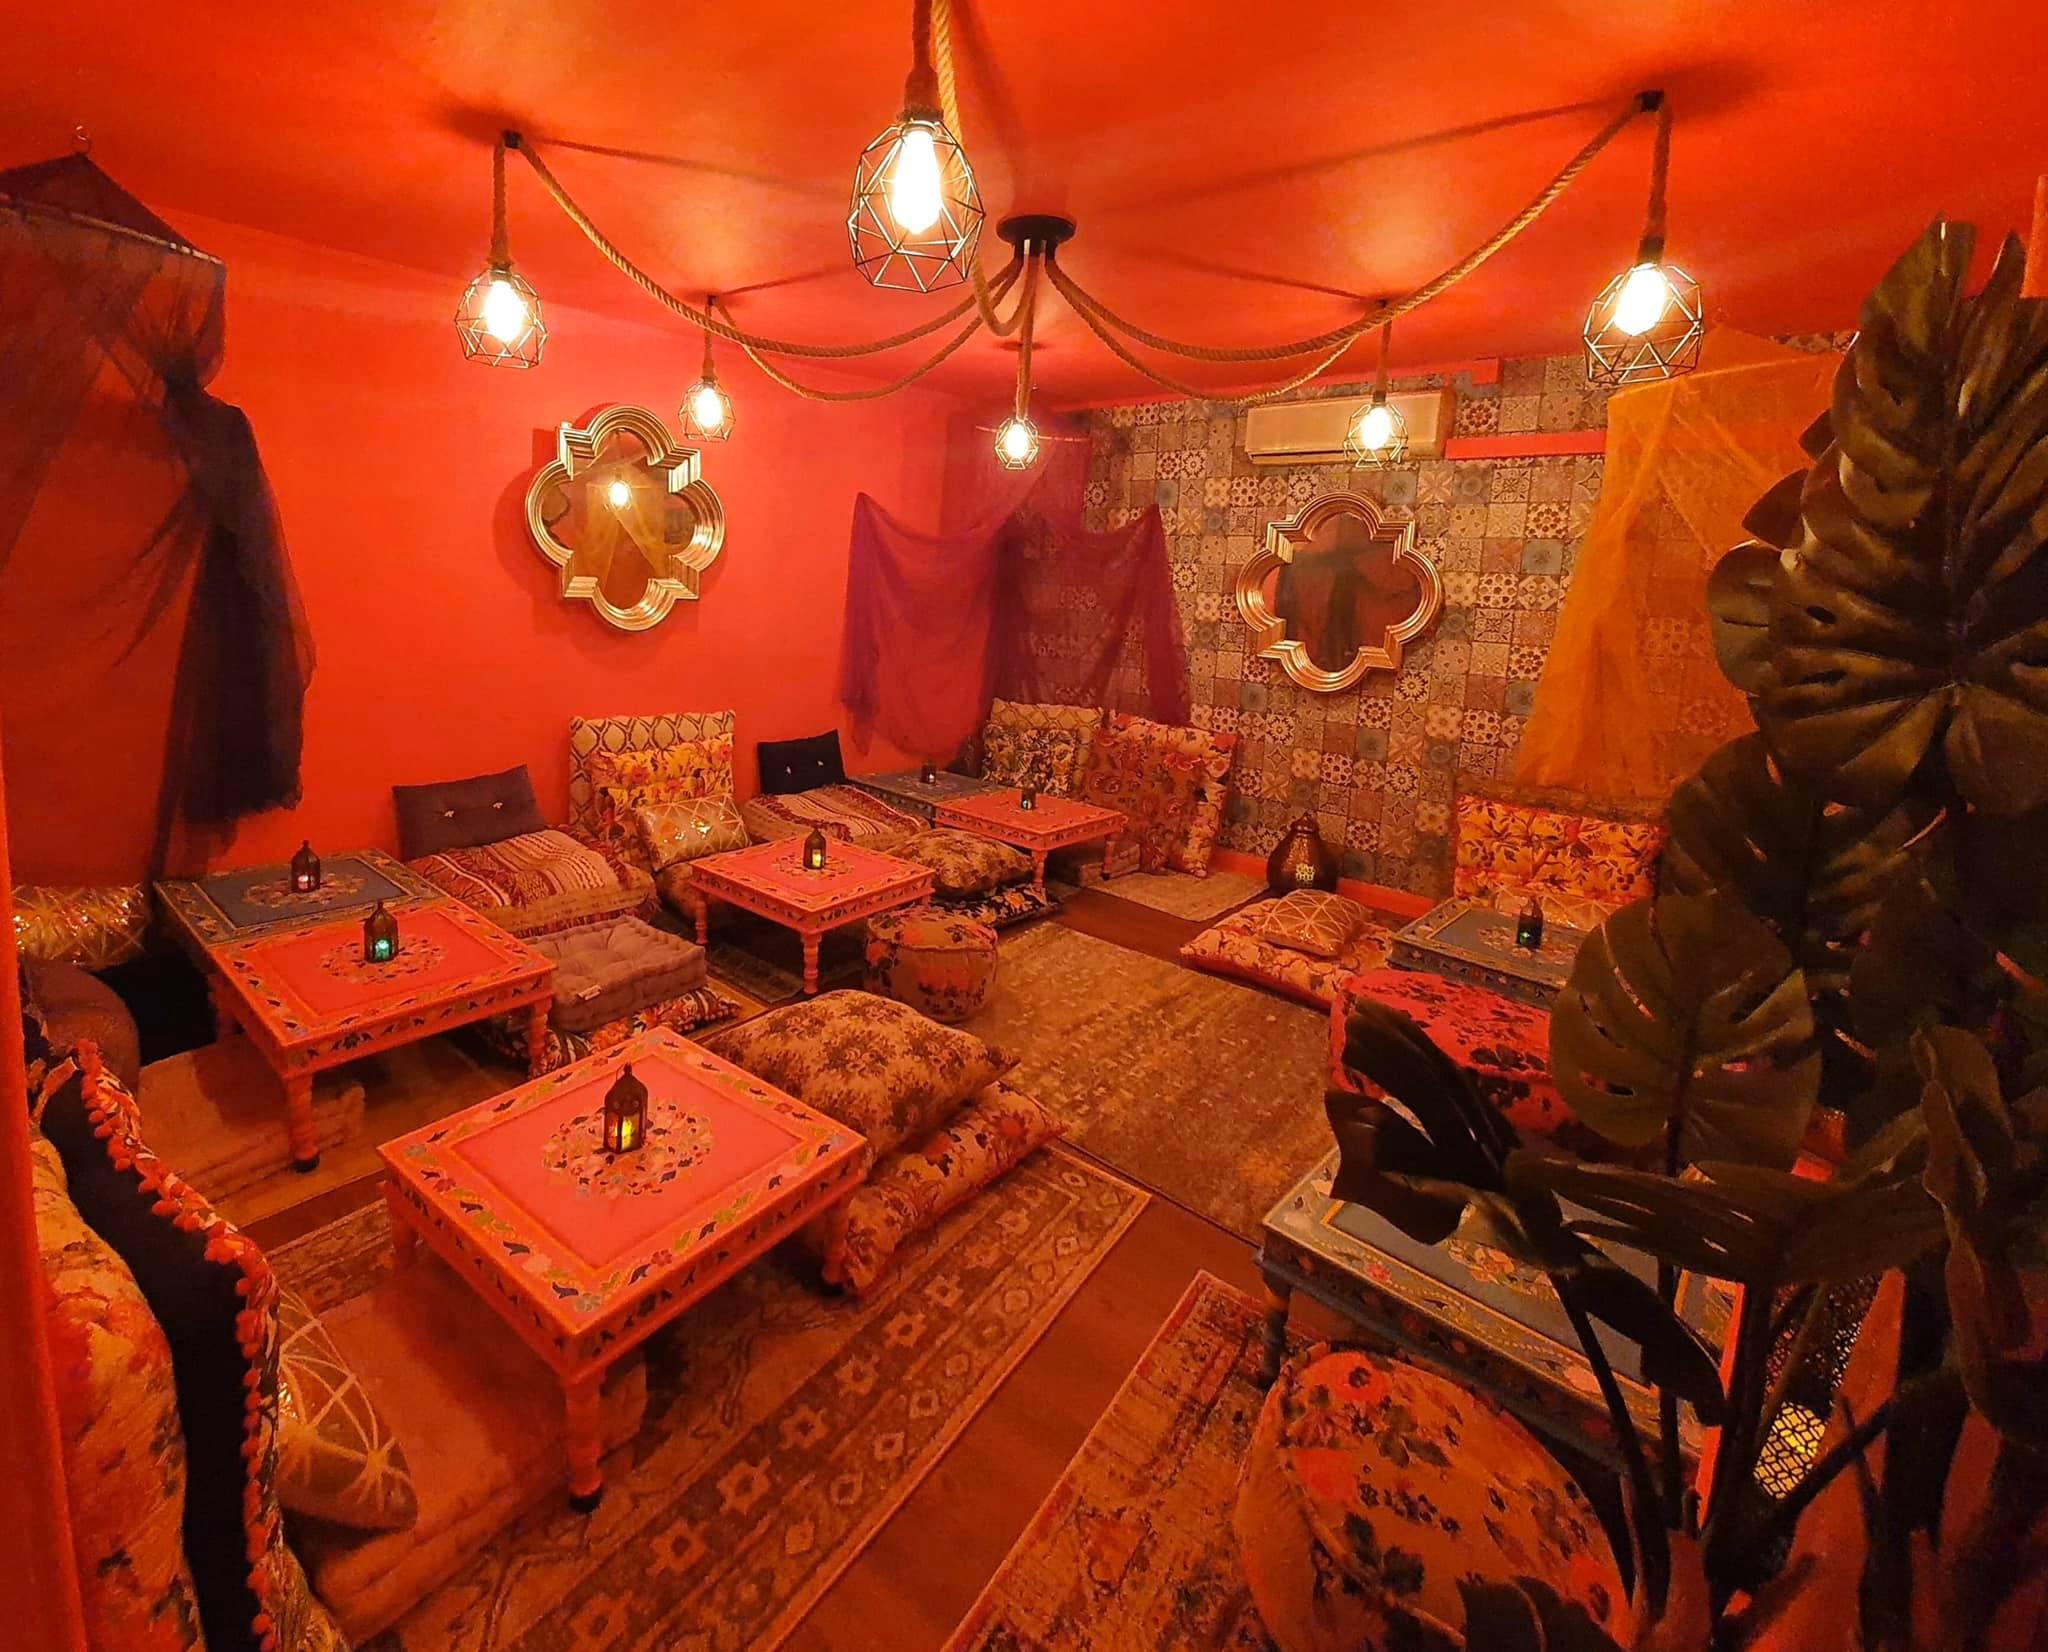 The Bohemian Room